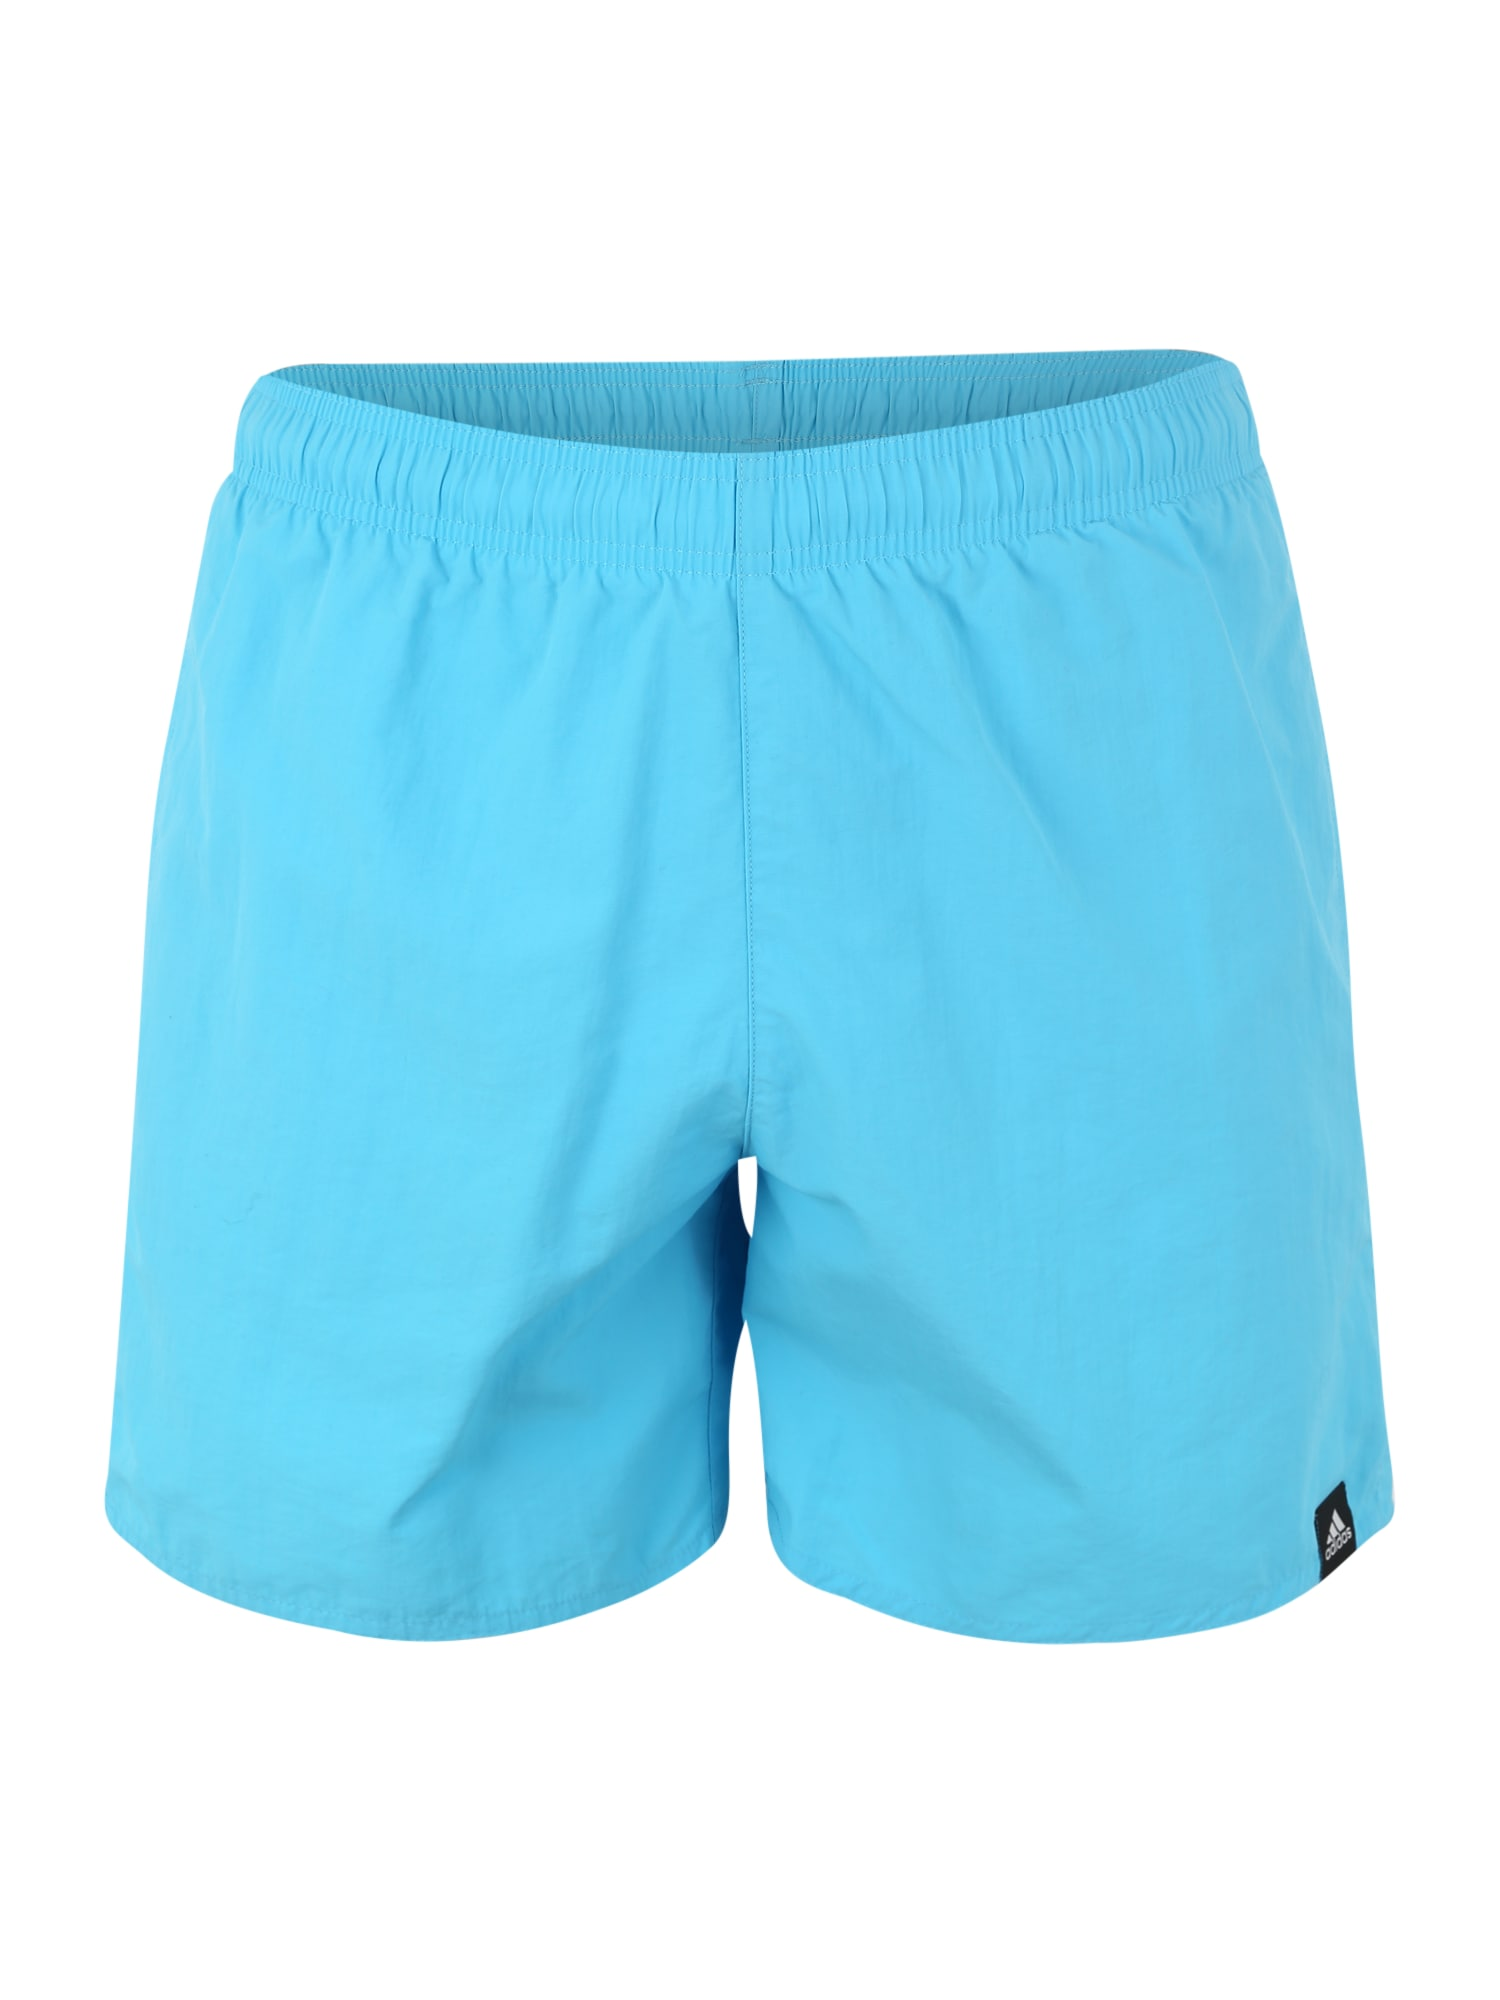 Sportovní plavky SOLID SH SL aqua modrá ADIDAS PERFORMANCE